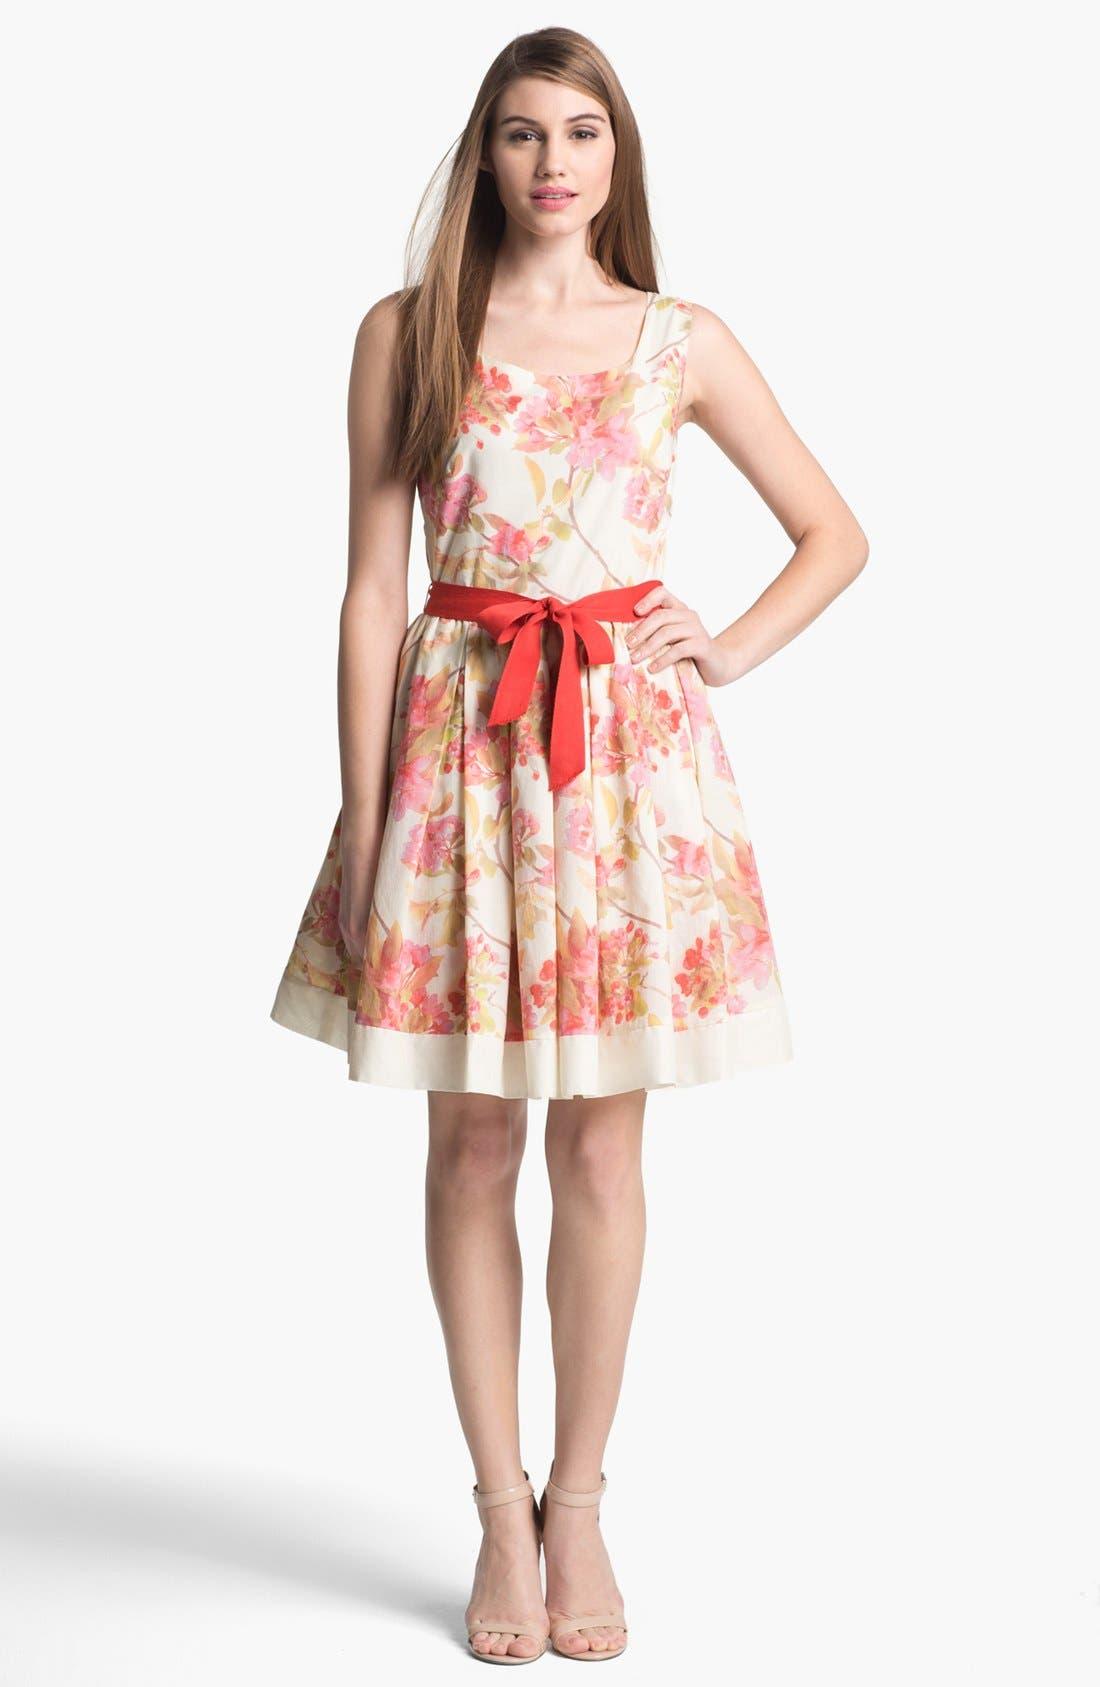 Alternate Image 1 Selected - Taylor Dresses Floral Print Fit & Flare Dress